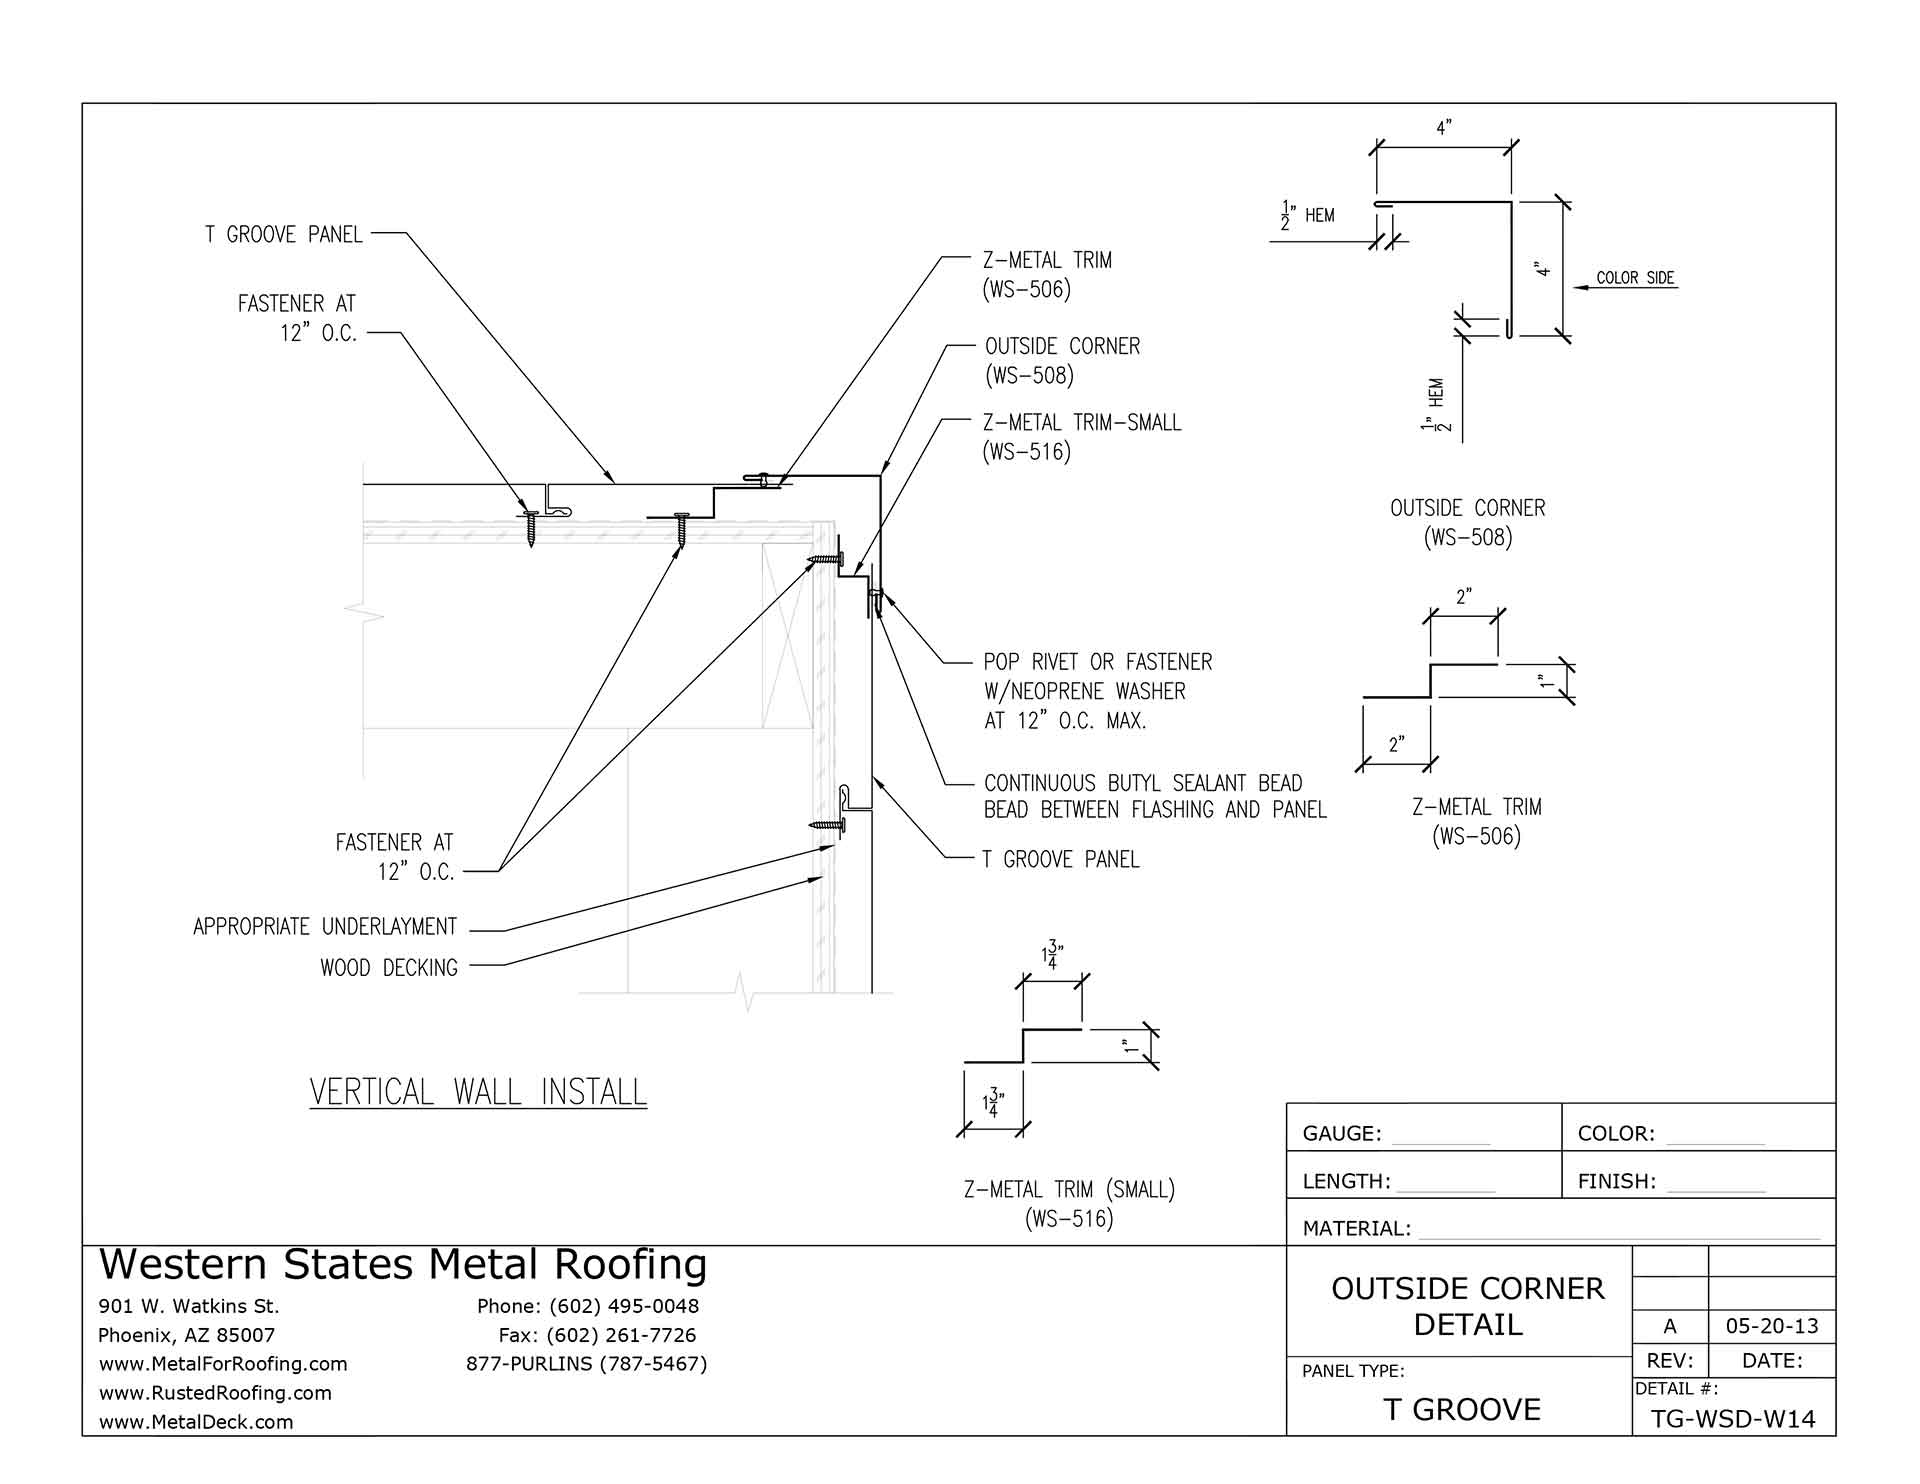 https://f.hubspotusercontent30.net/hubfs/6069238/images/trim-flashings/t-groove/tg-wsd-w14-outside-corner-detail.jpg